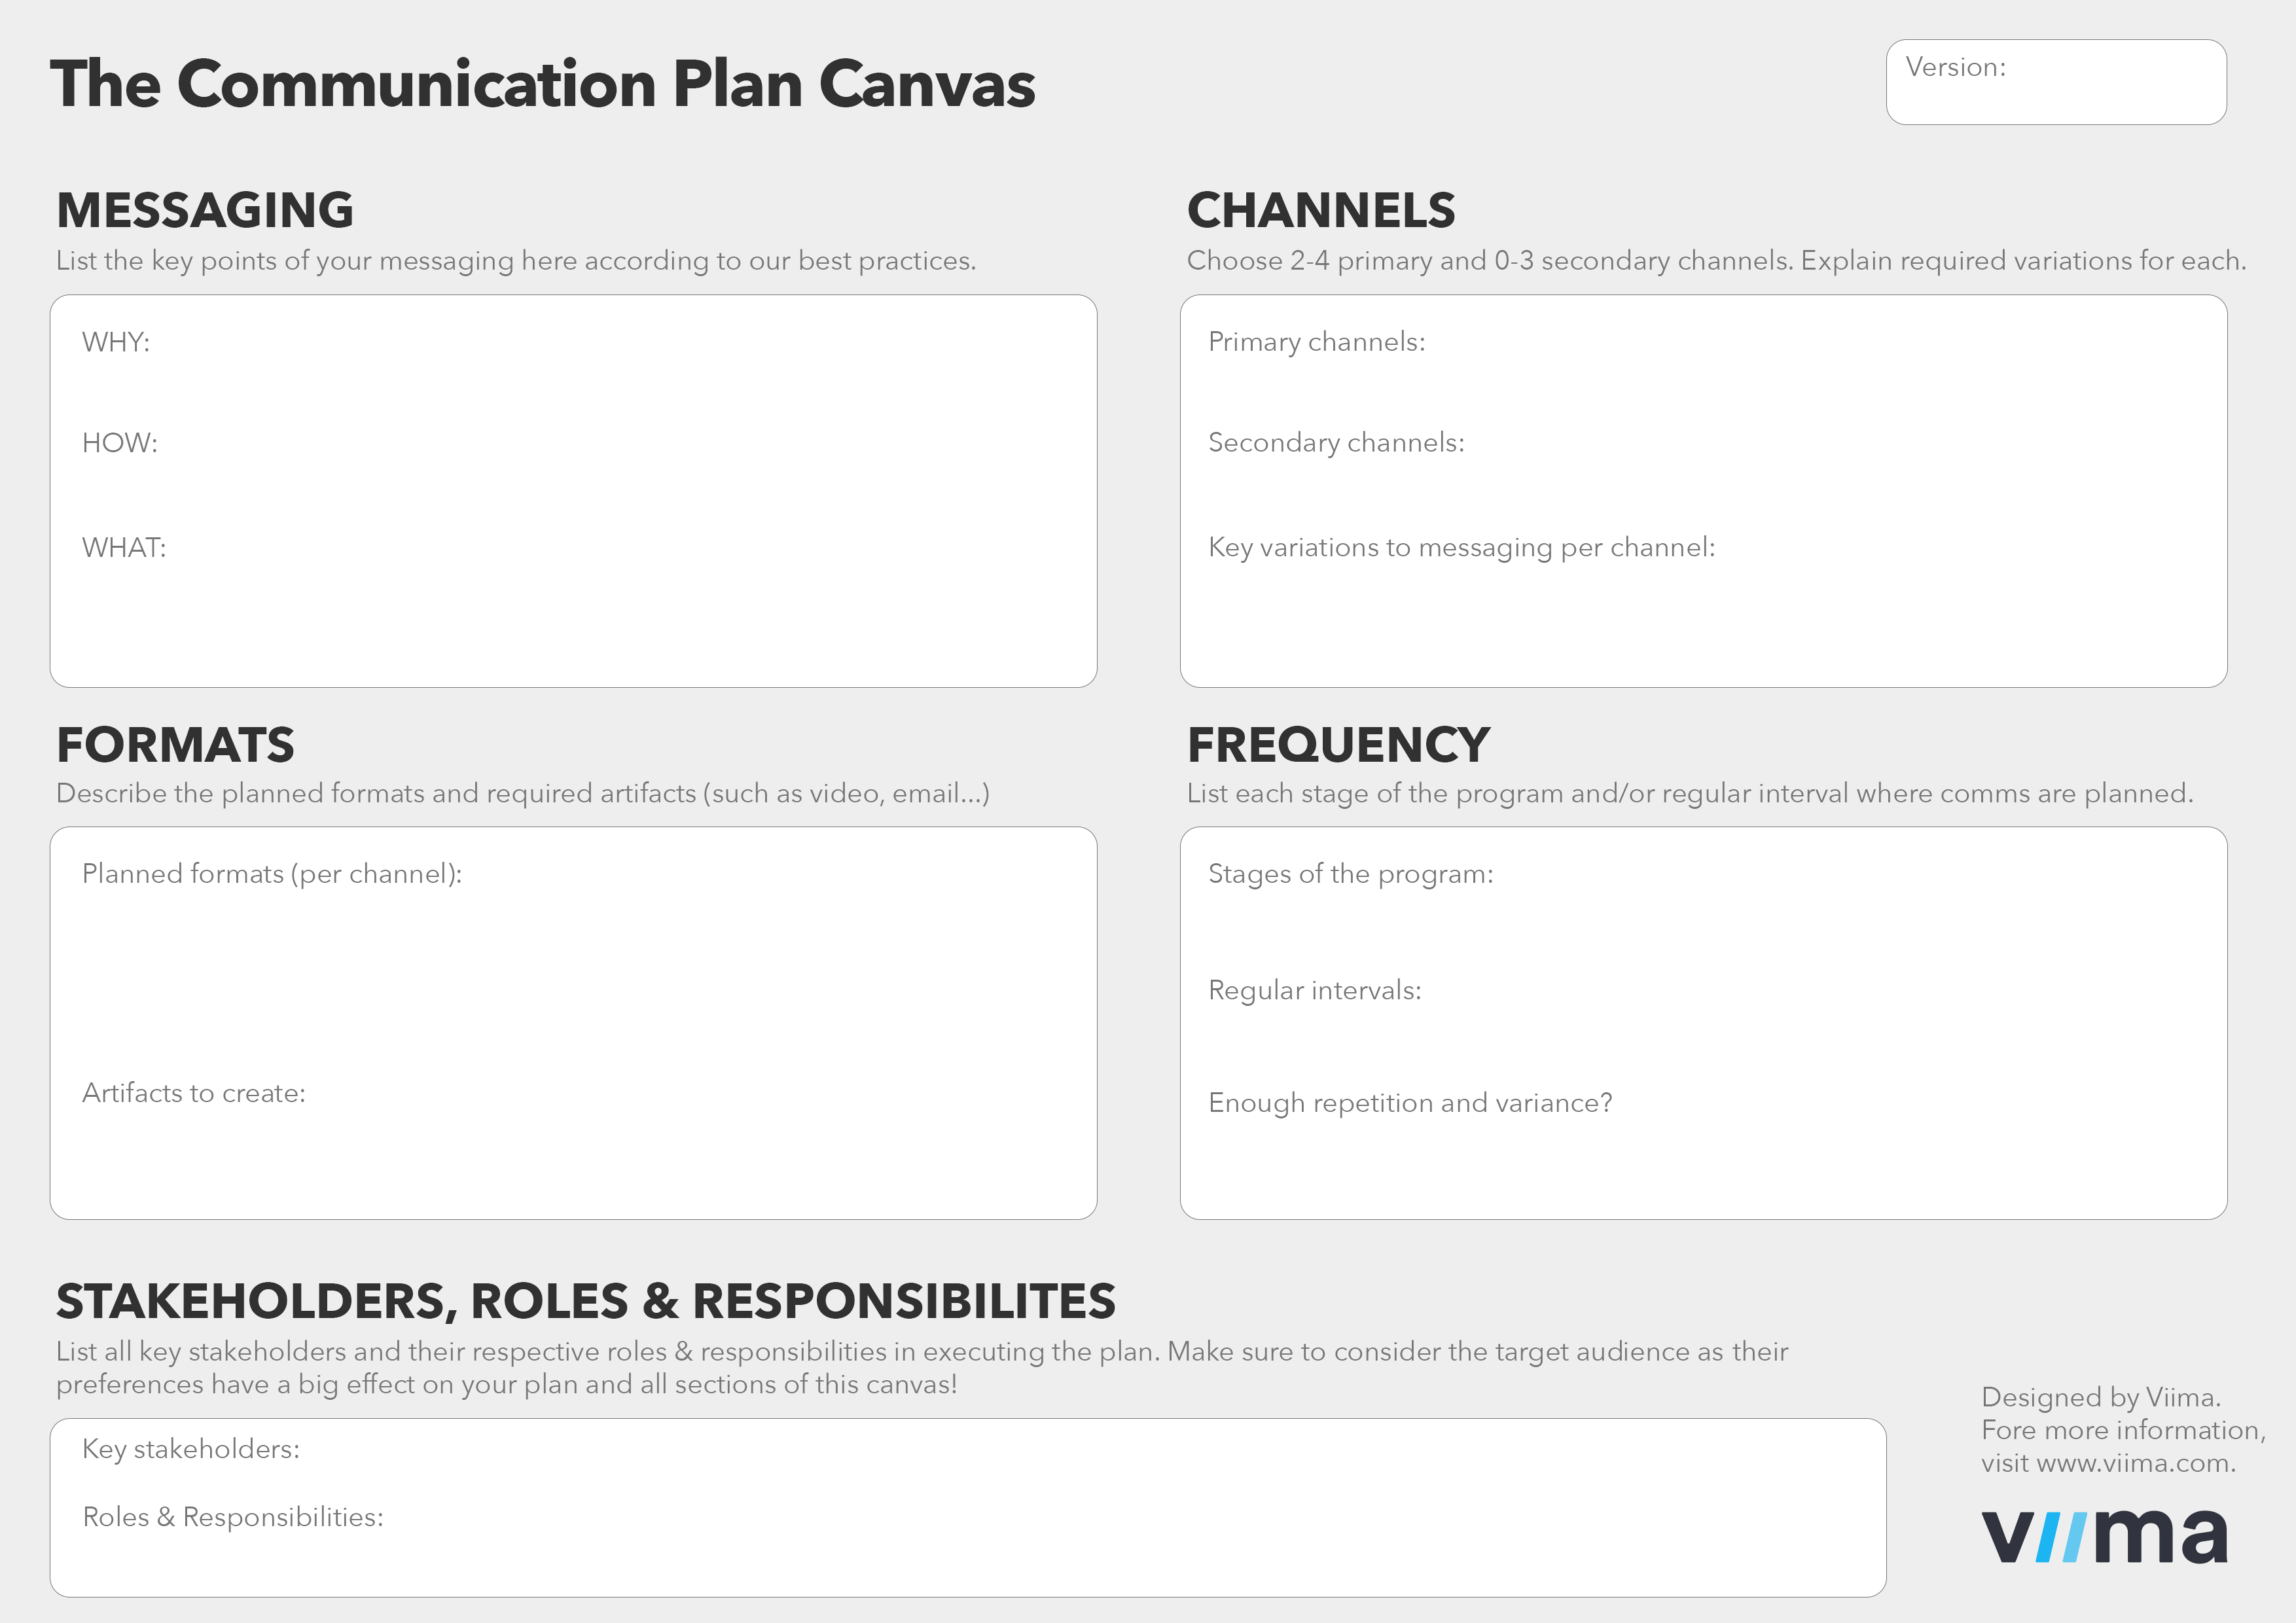 Viima Communication Plan Canvas